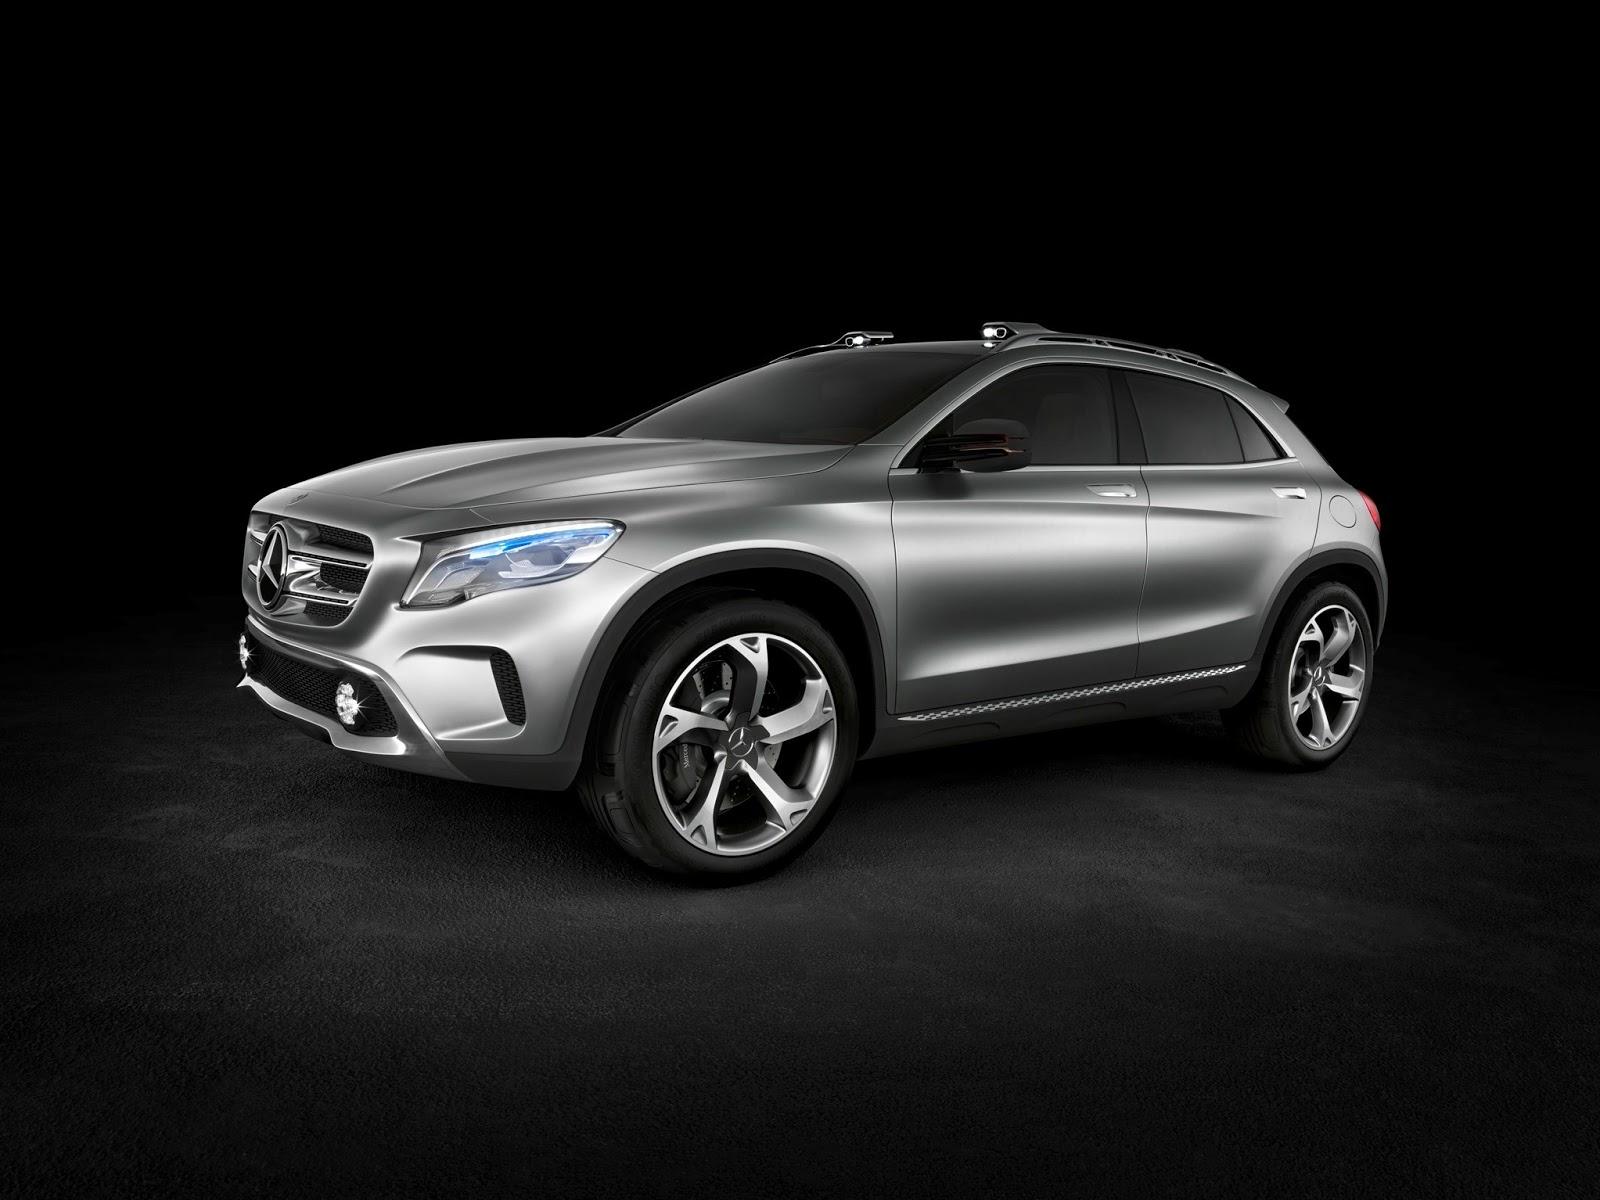 Mercedes-Benz GLA-Class 2015, 2016, 2017 Model